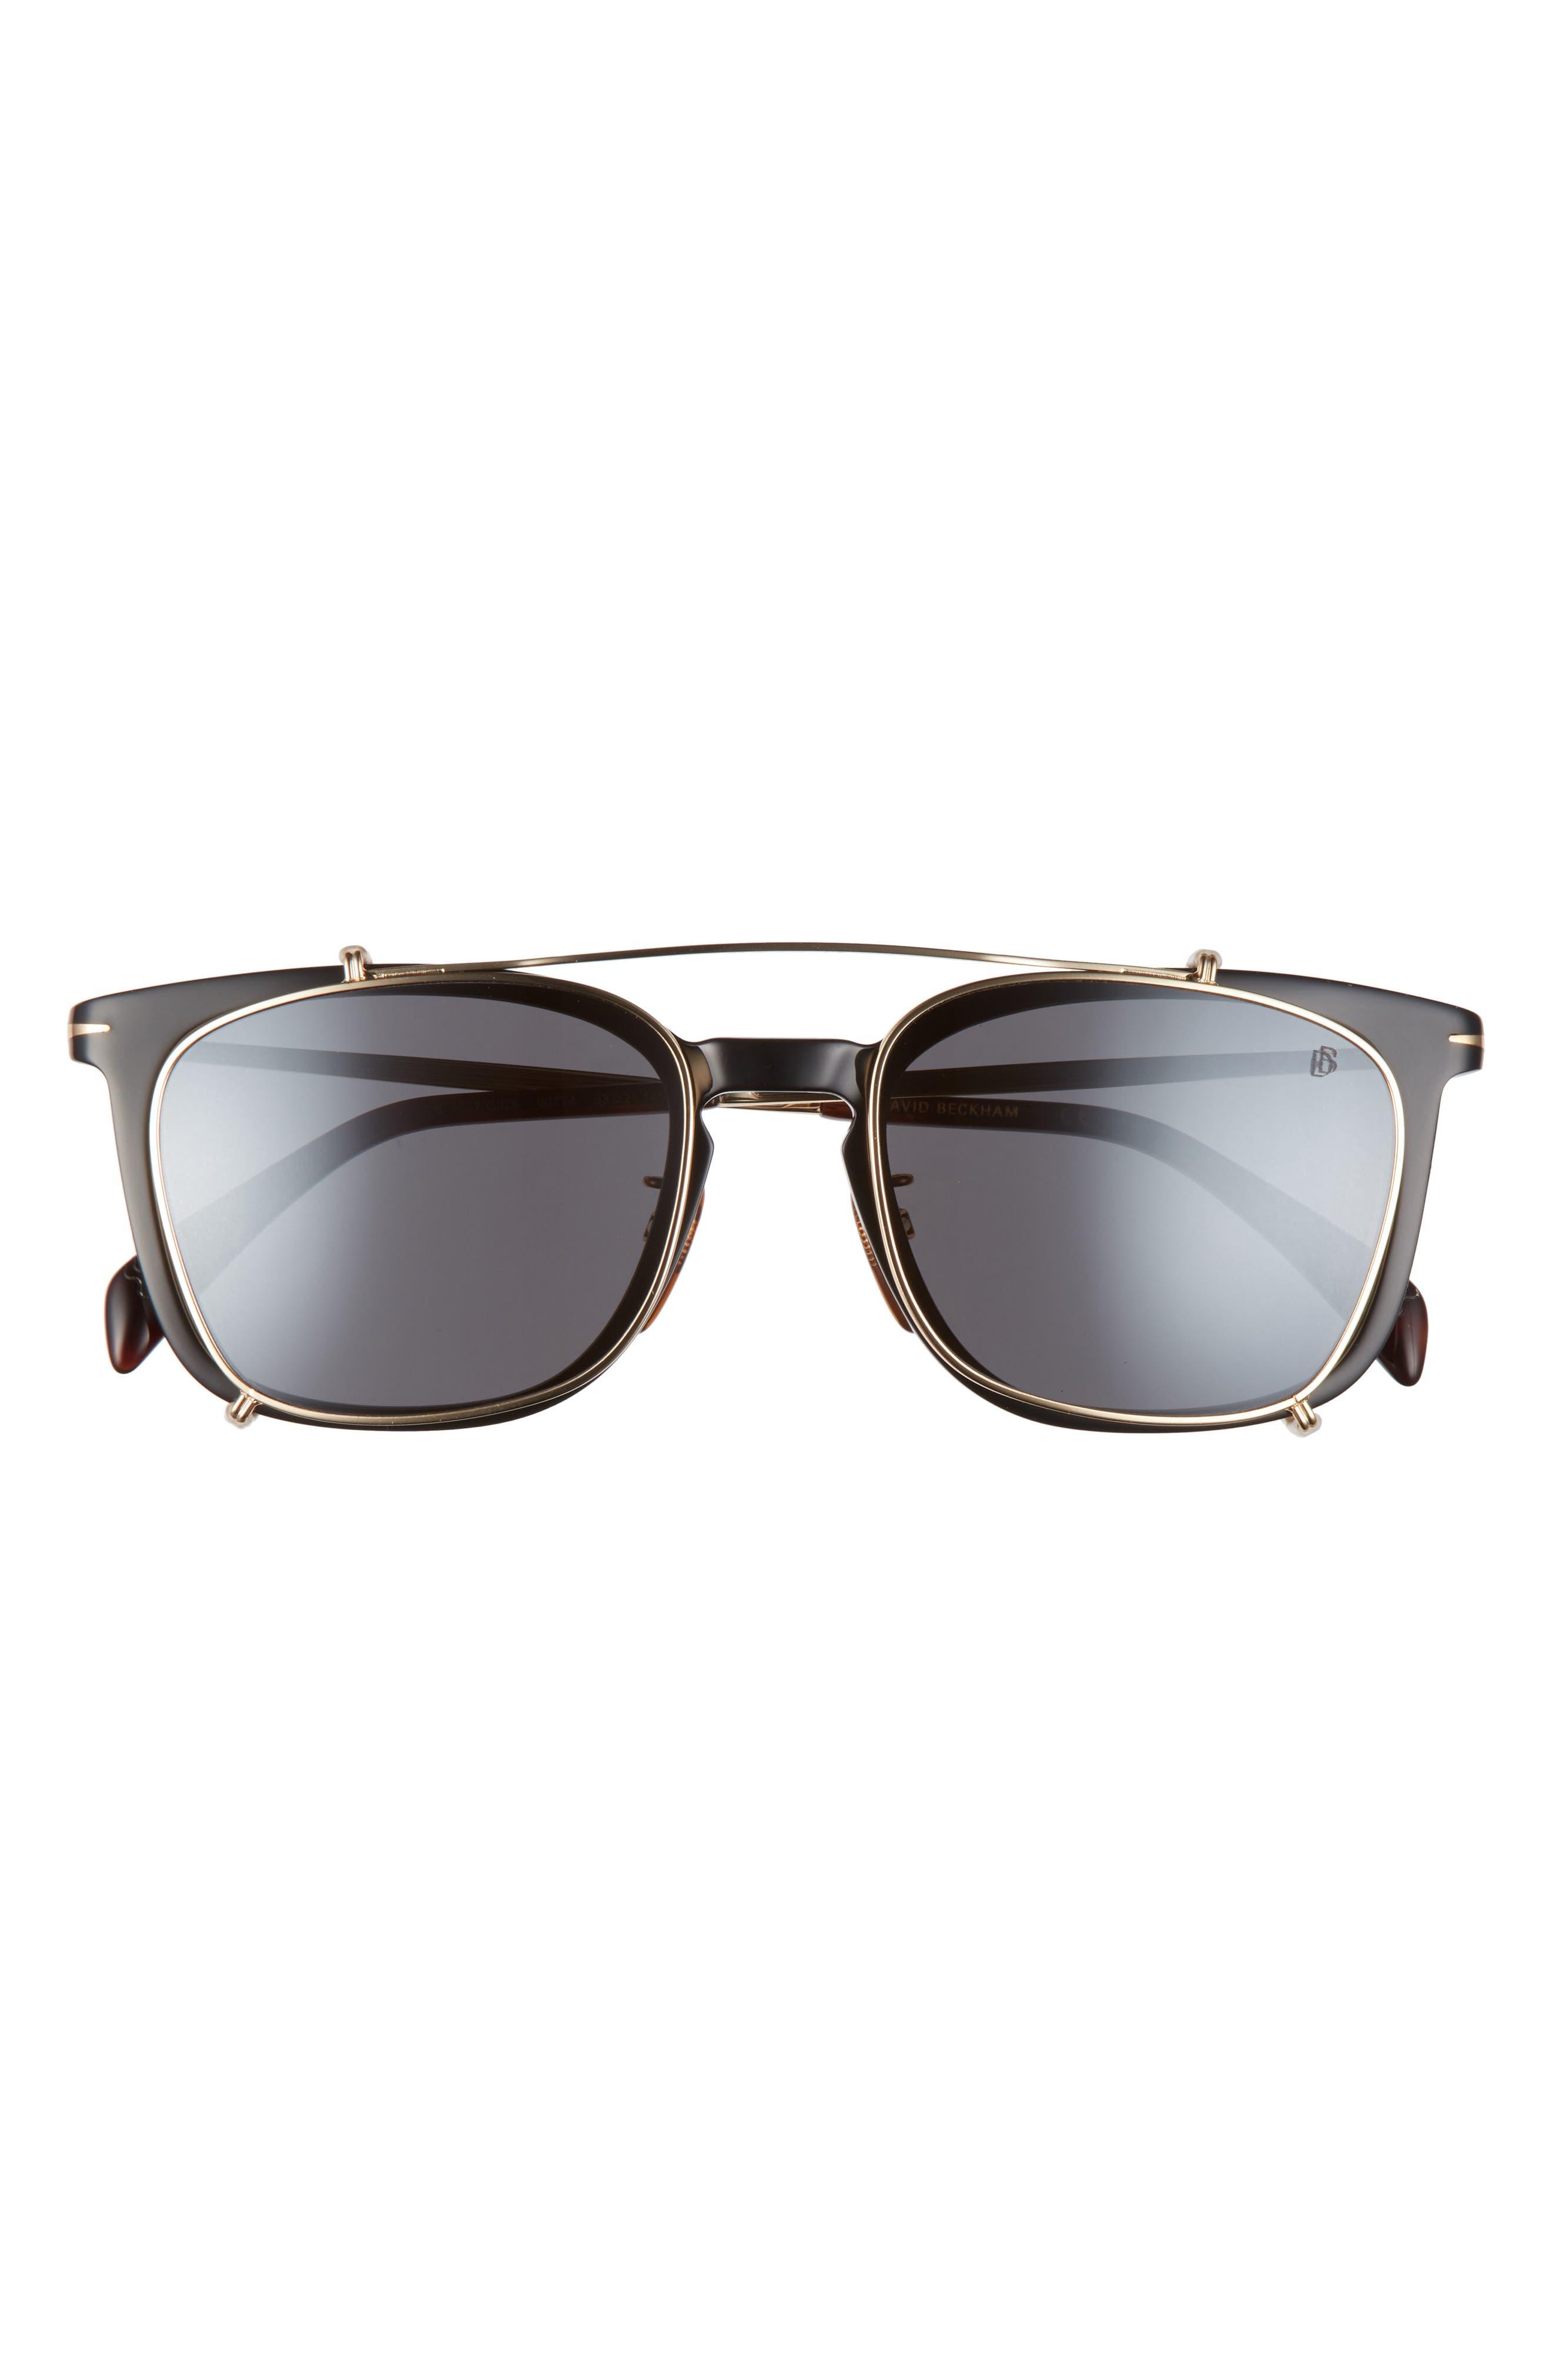 Men's Eyewear By David Beckham 53mm Rectangular Clip-On Sunglasses